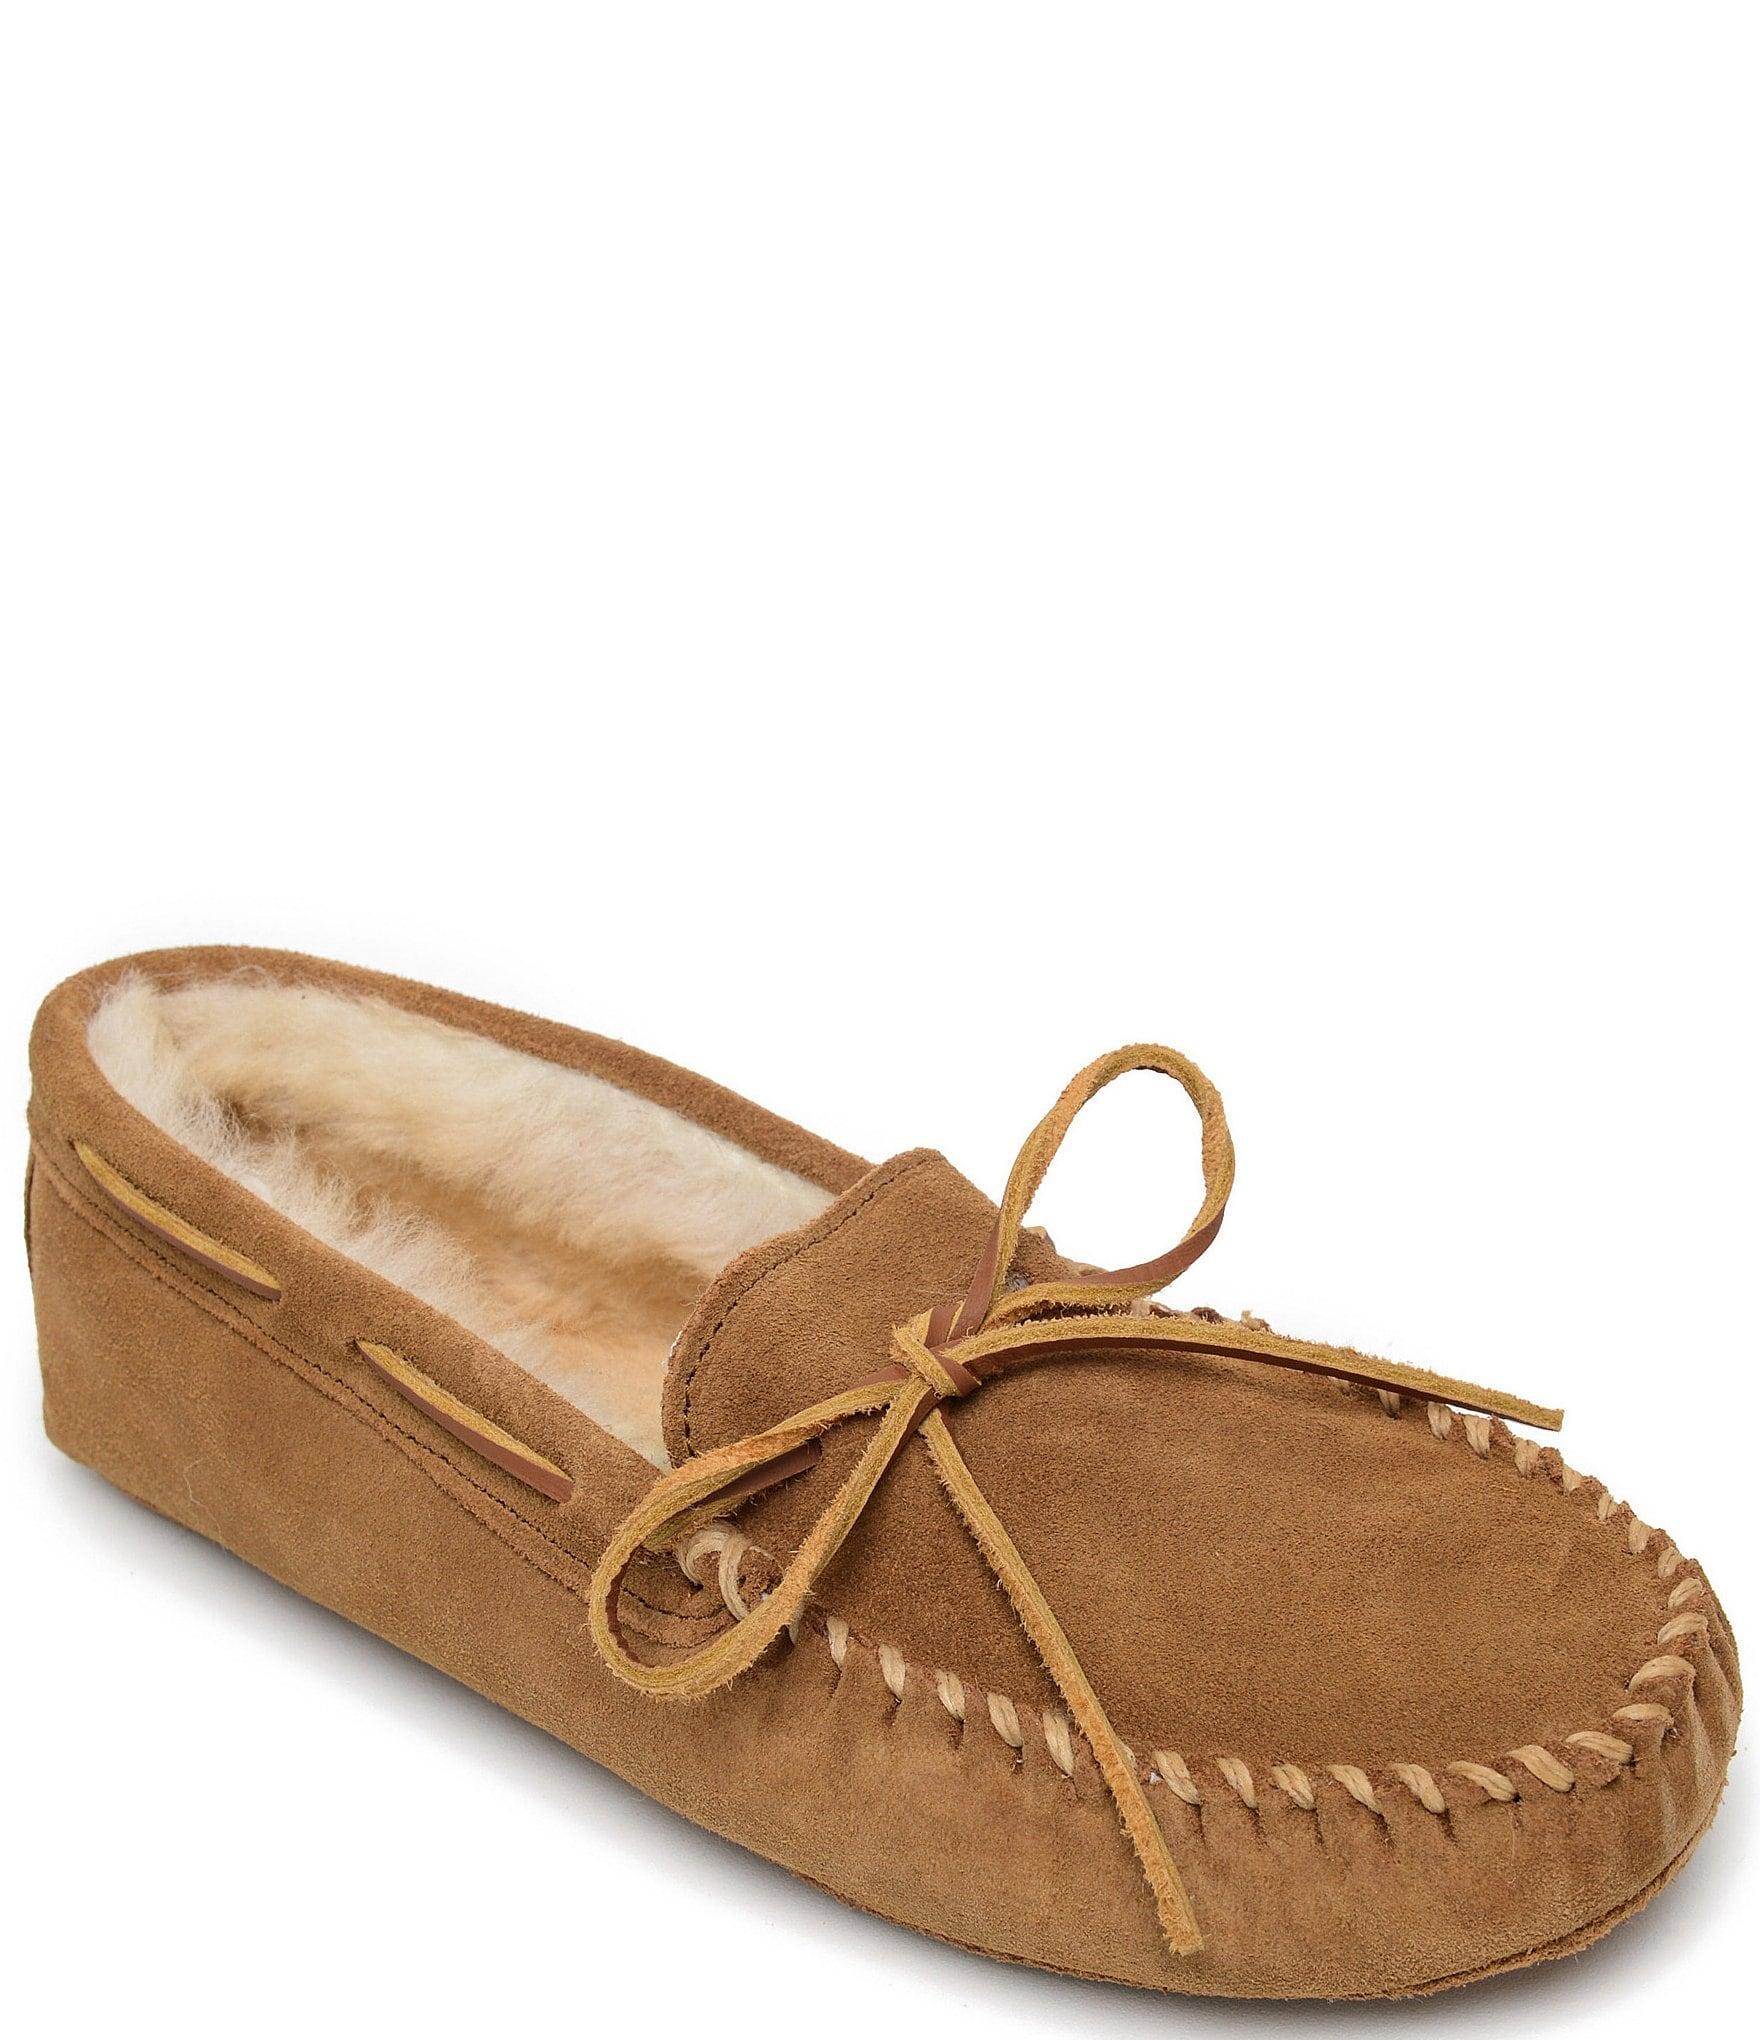 Sheepskin Softsole Moccasin Slipper